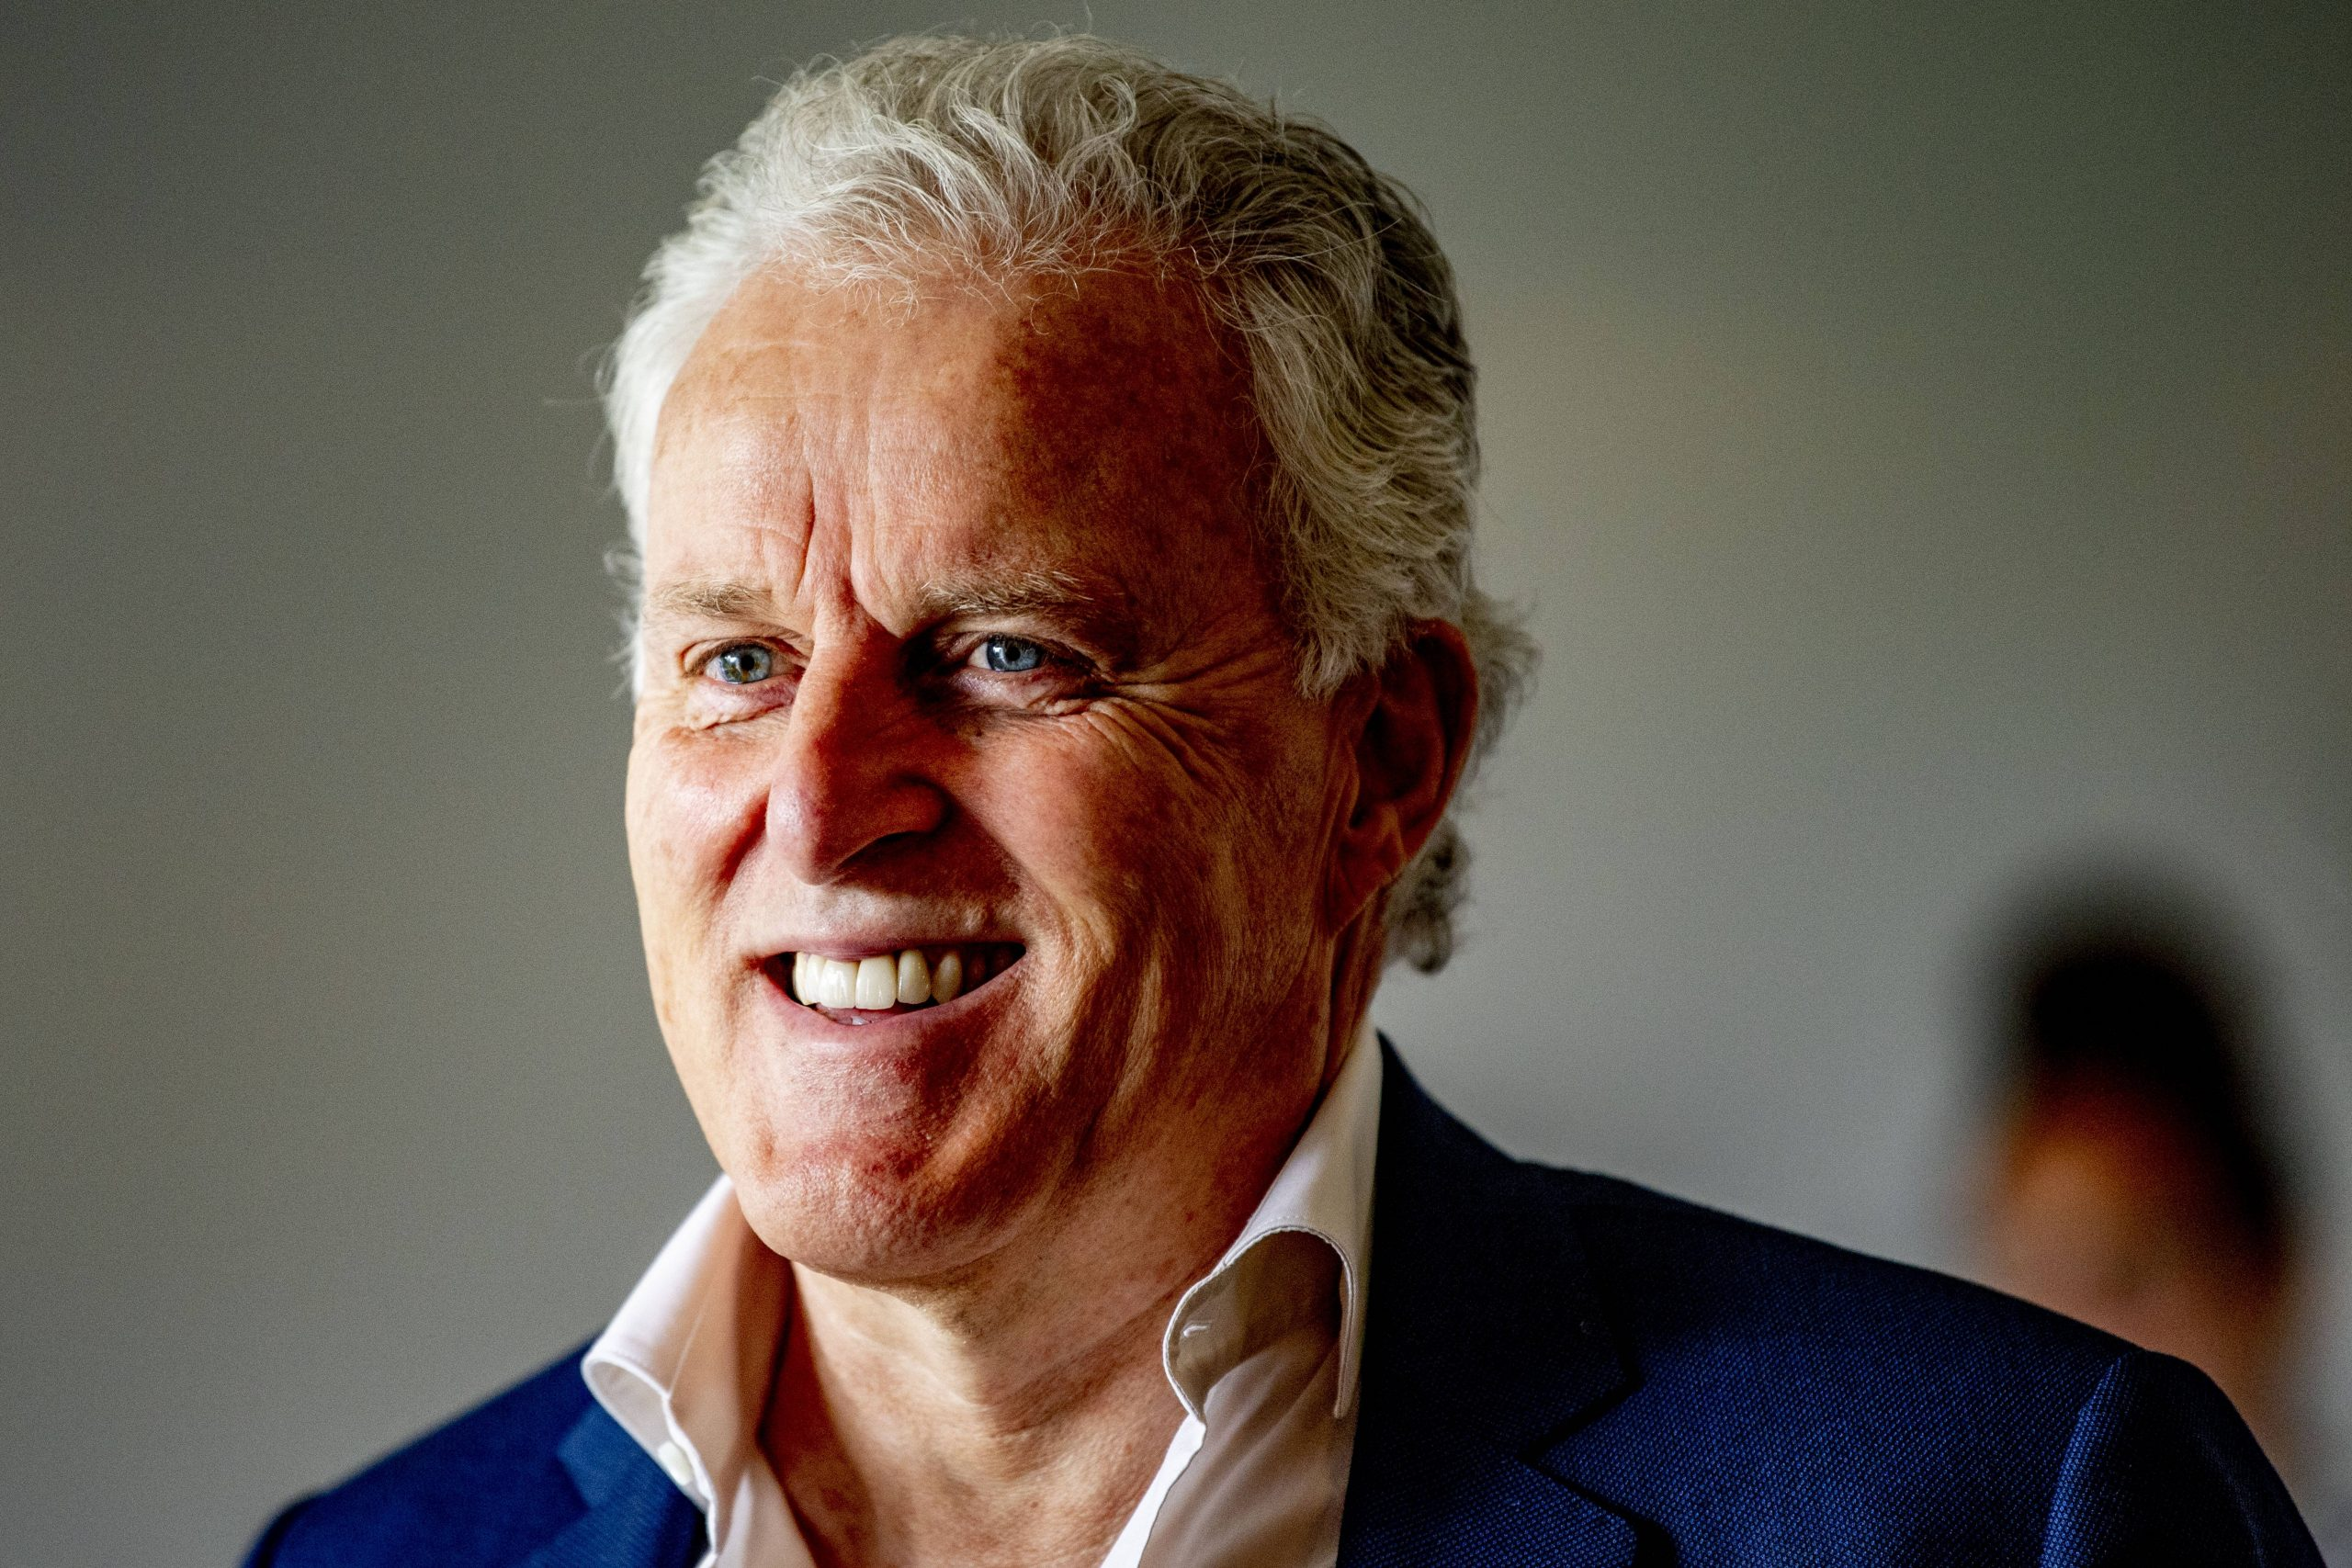 Niederlande: der Kriminal-Journalist Peter R. de Vries ist in Amsterdam niedergeschossen worden.